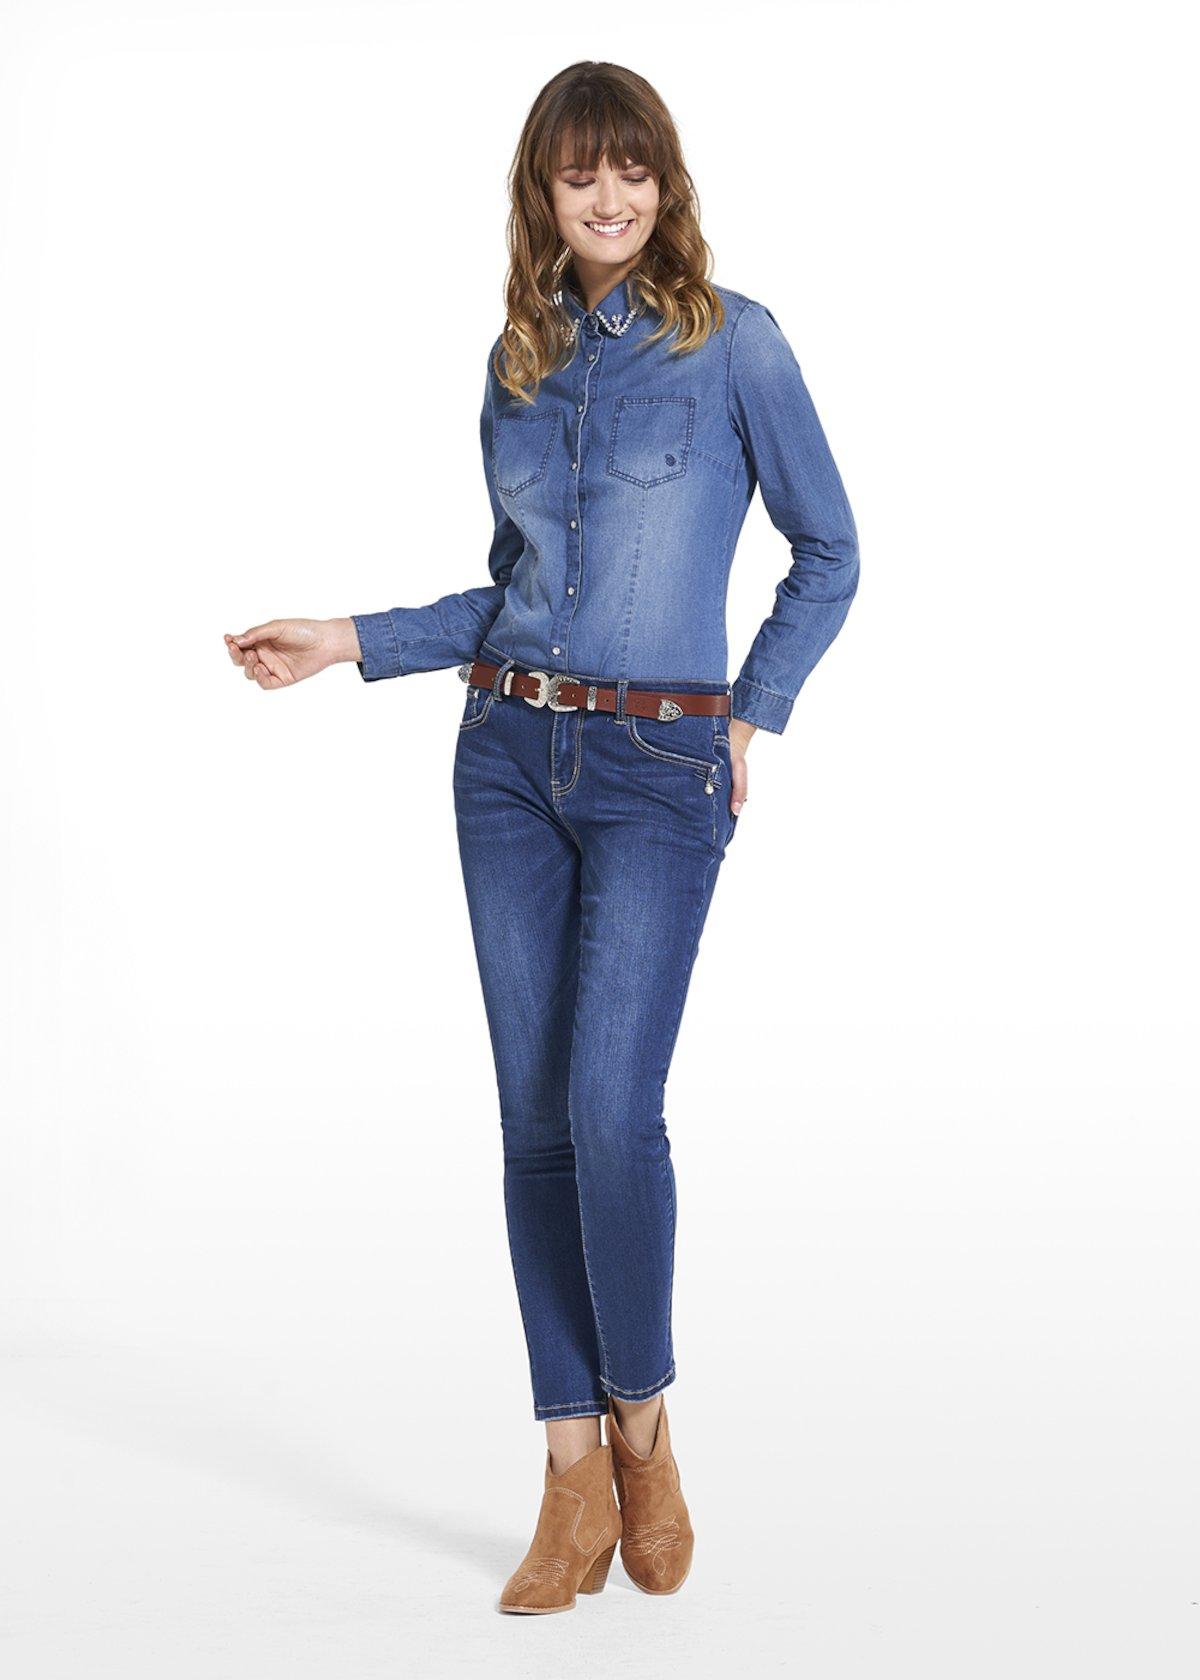 5-pocket skinny leg pants with a grosgrain ribbon detail - Dark Denim - Woman